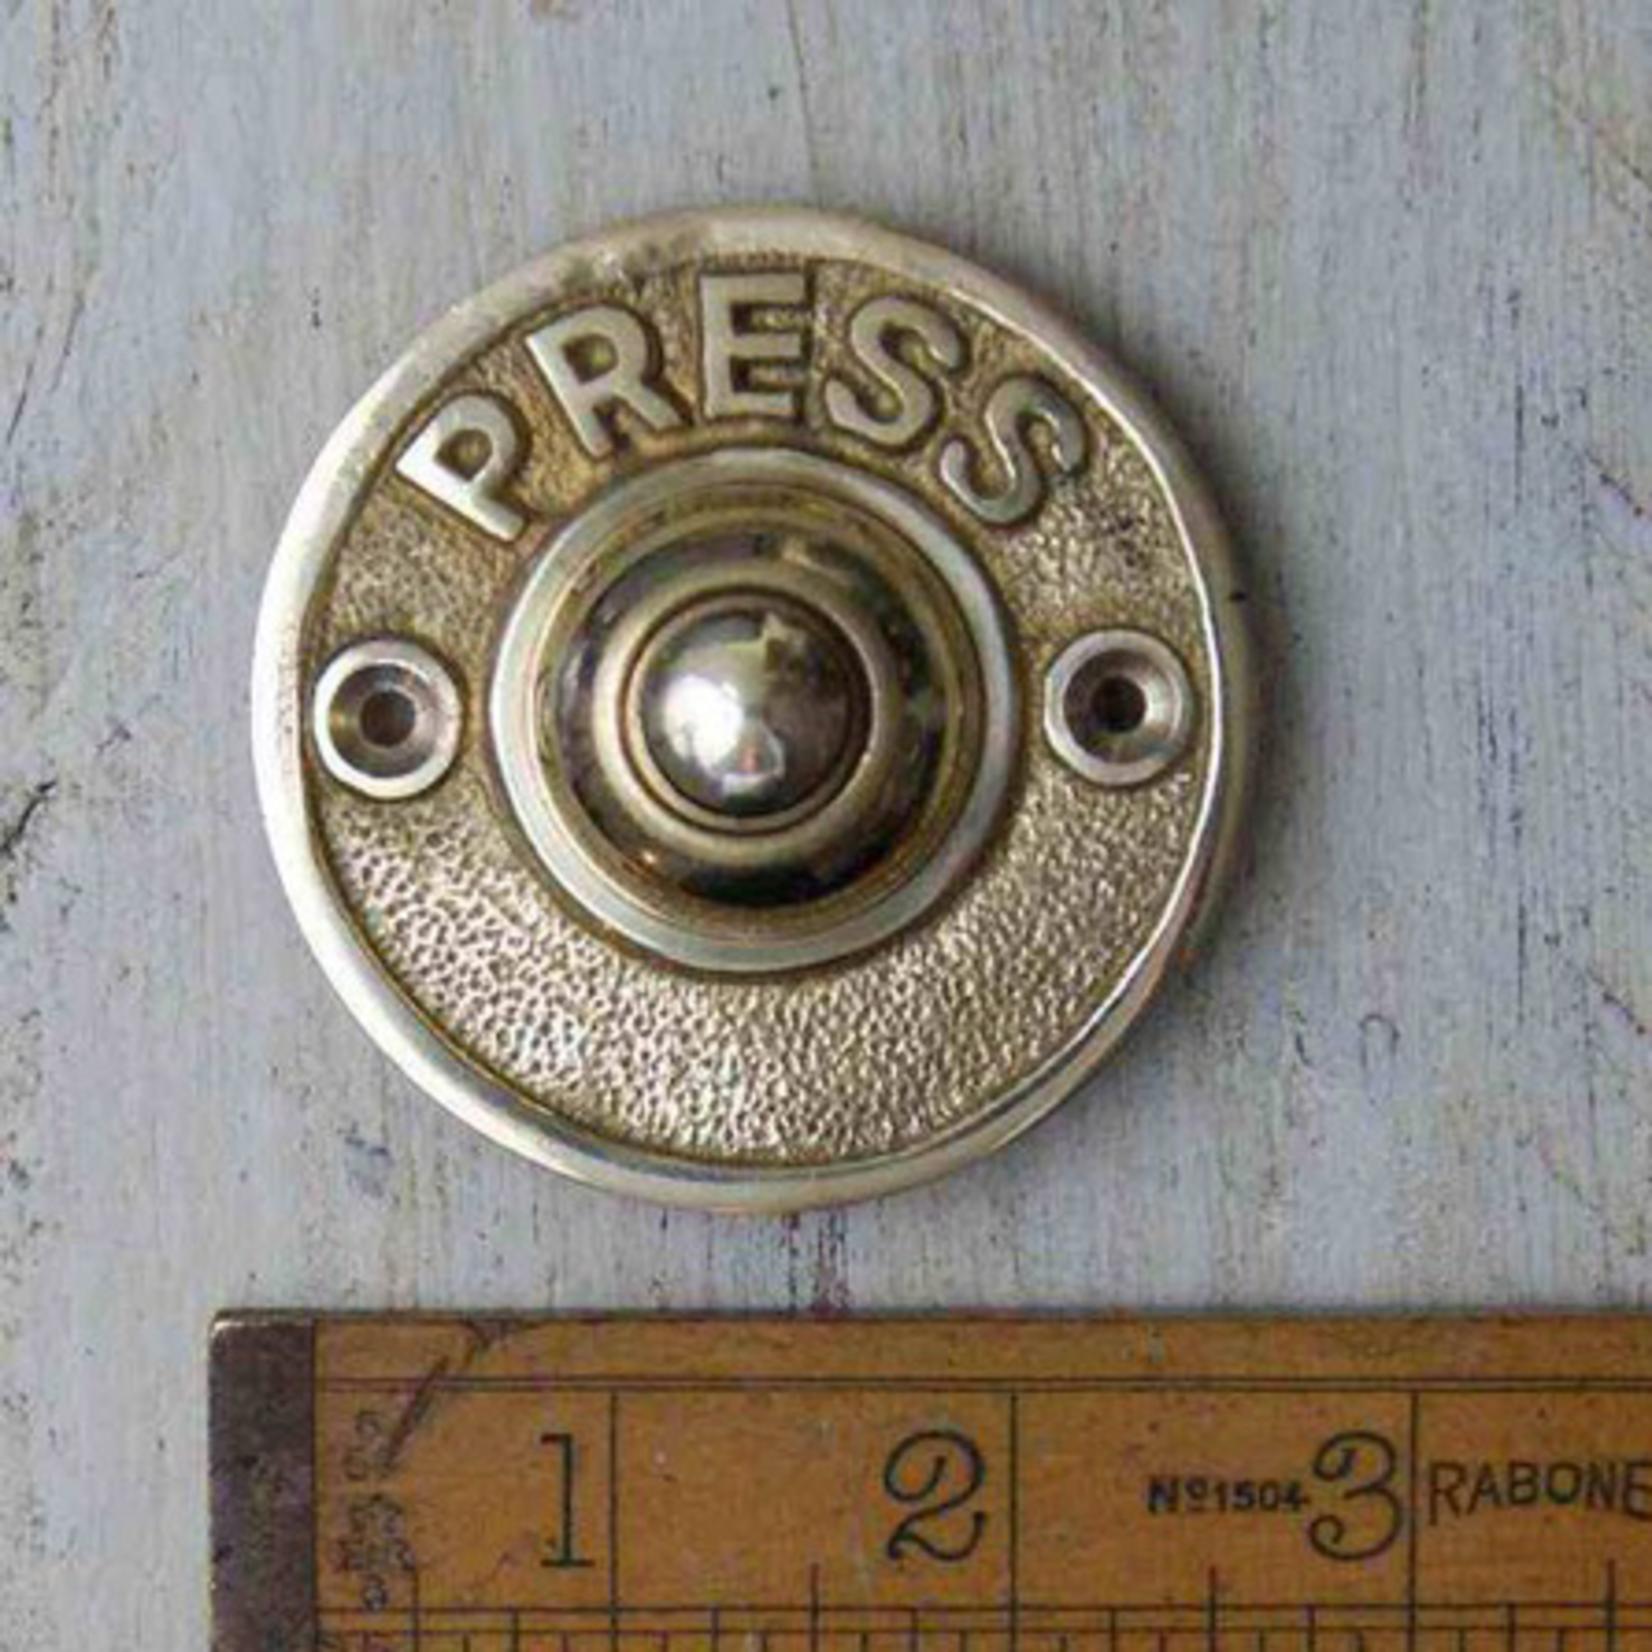 IRON RANGE Door Bell Push 'PRESS' Round Solid Brass